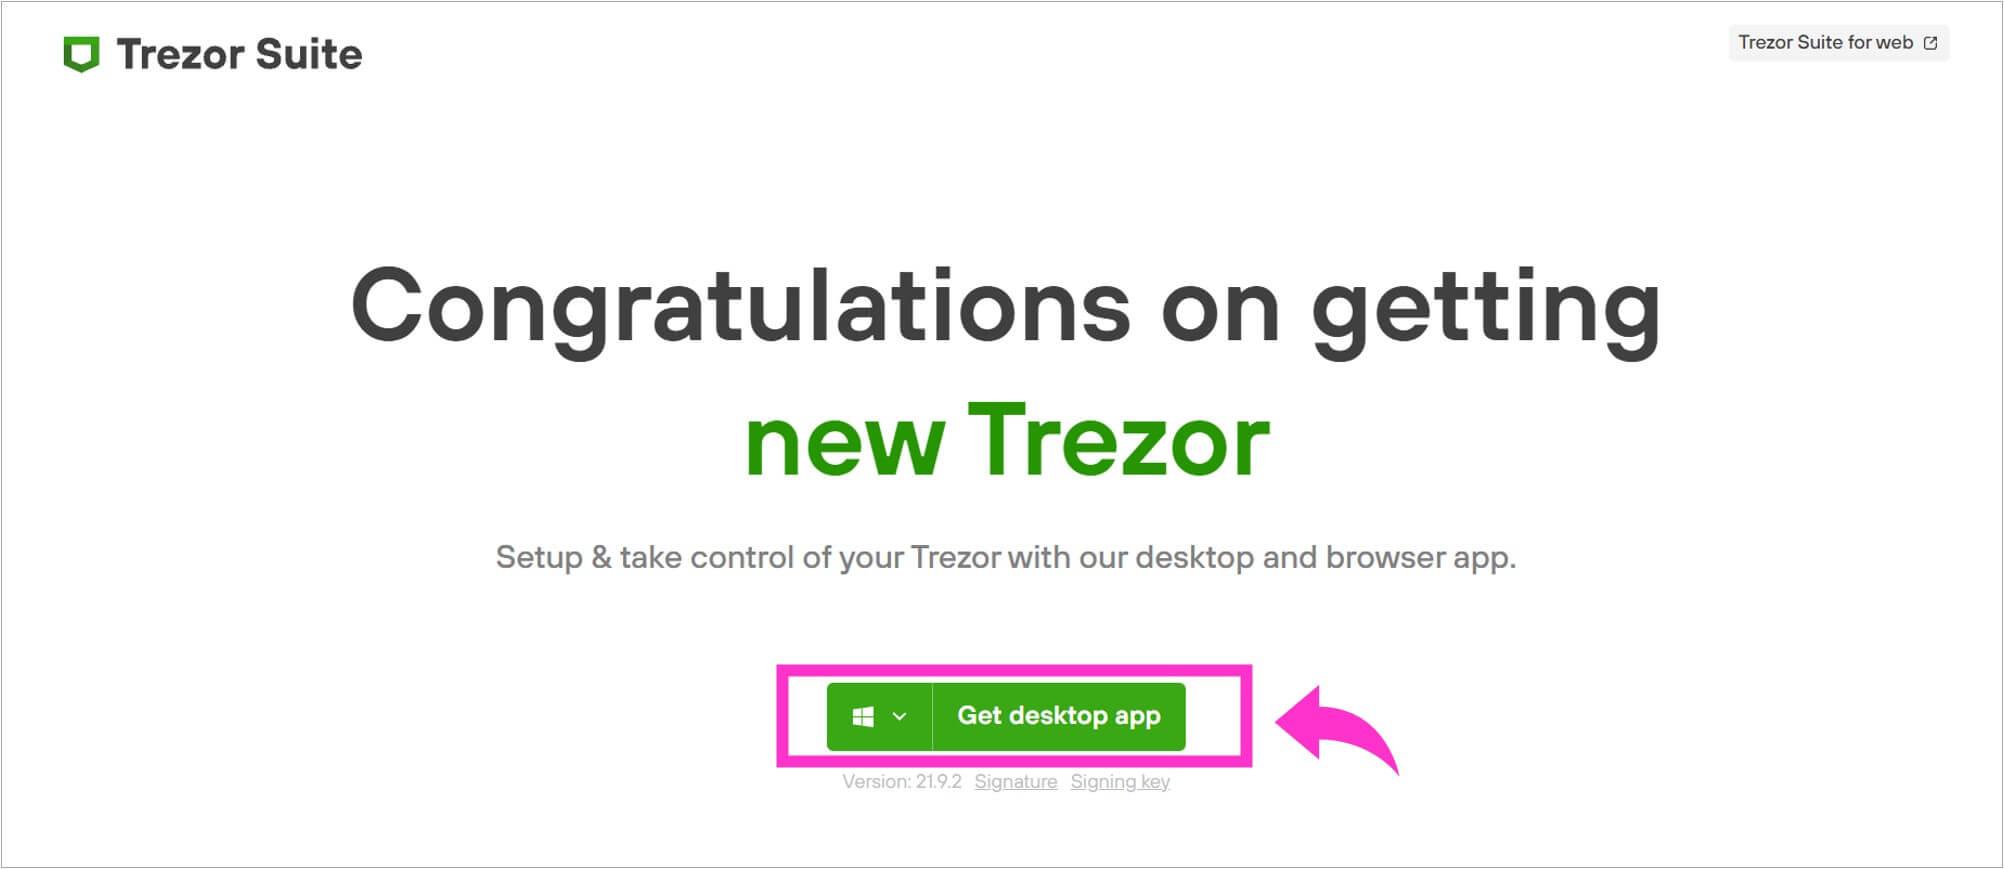 「Get desktop app」を選択